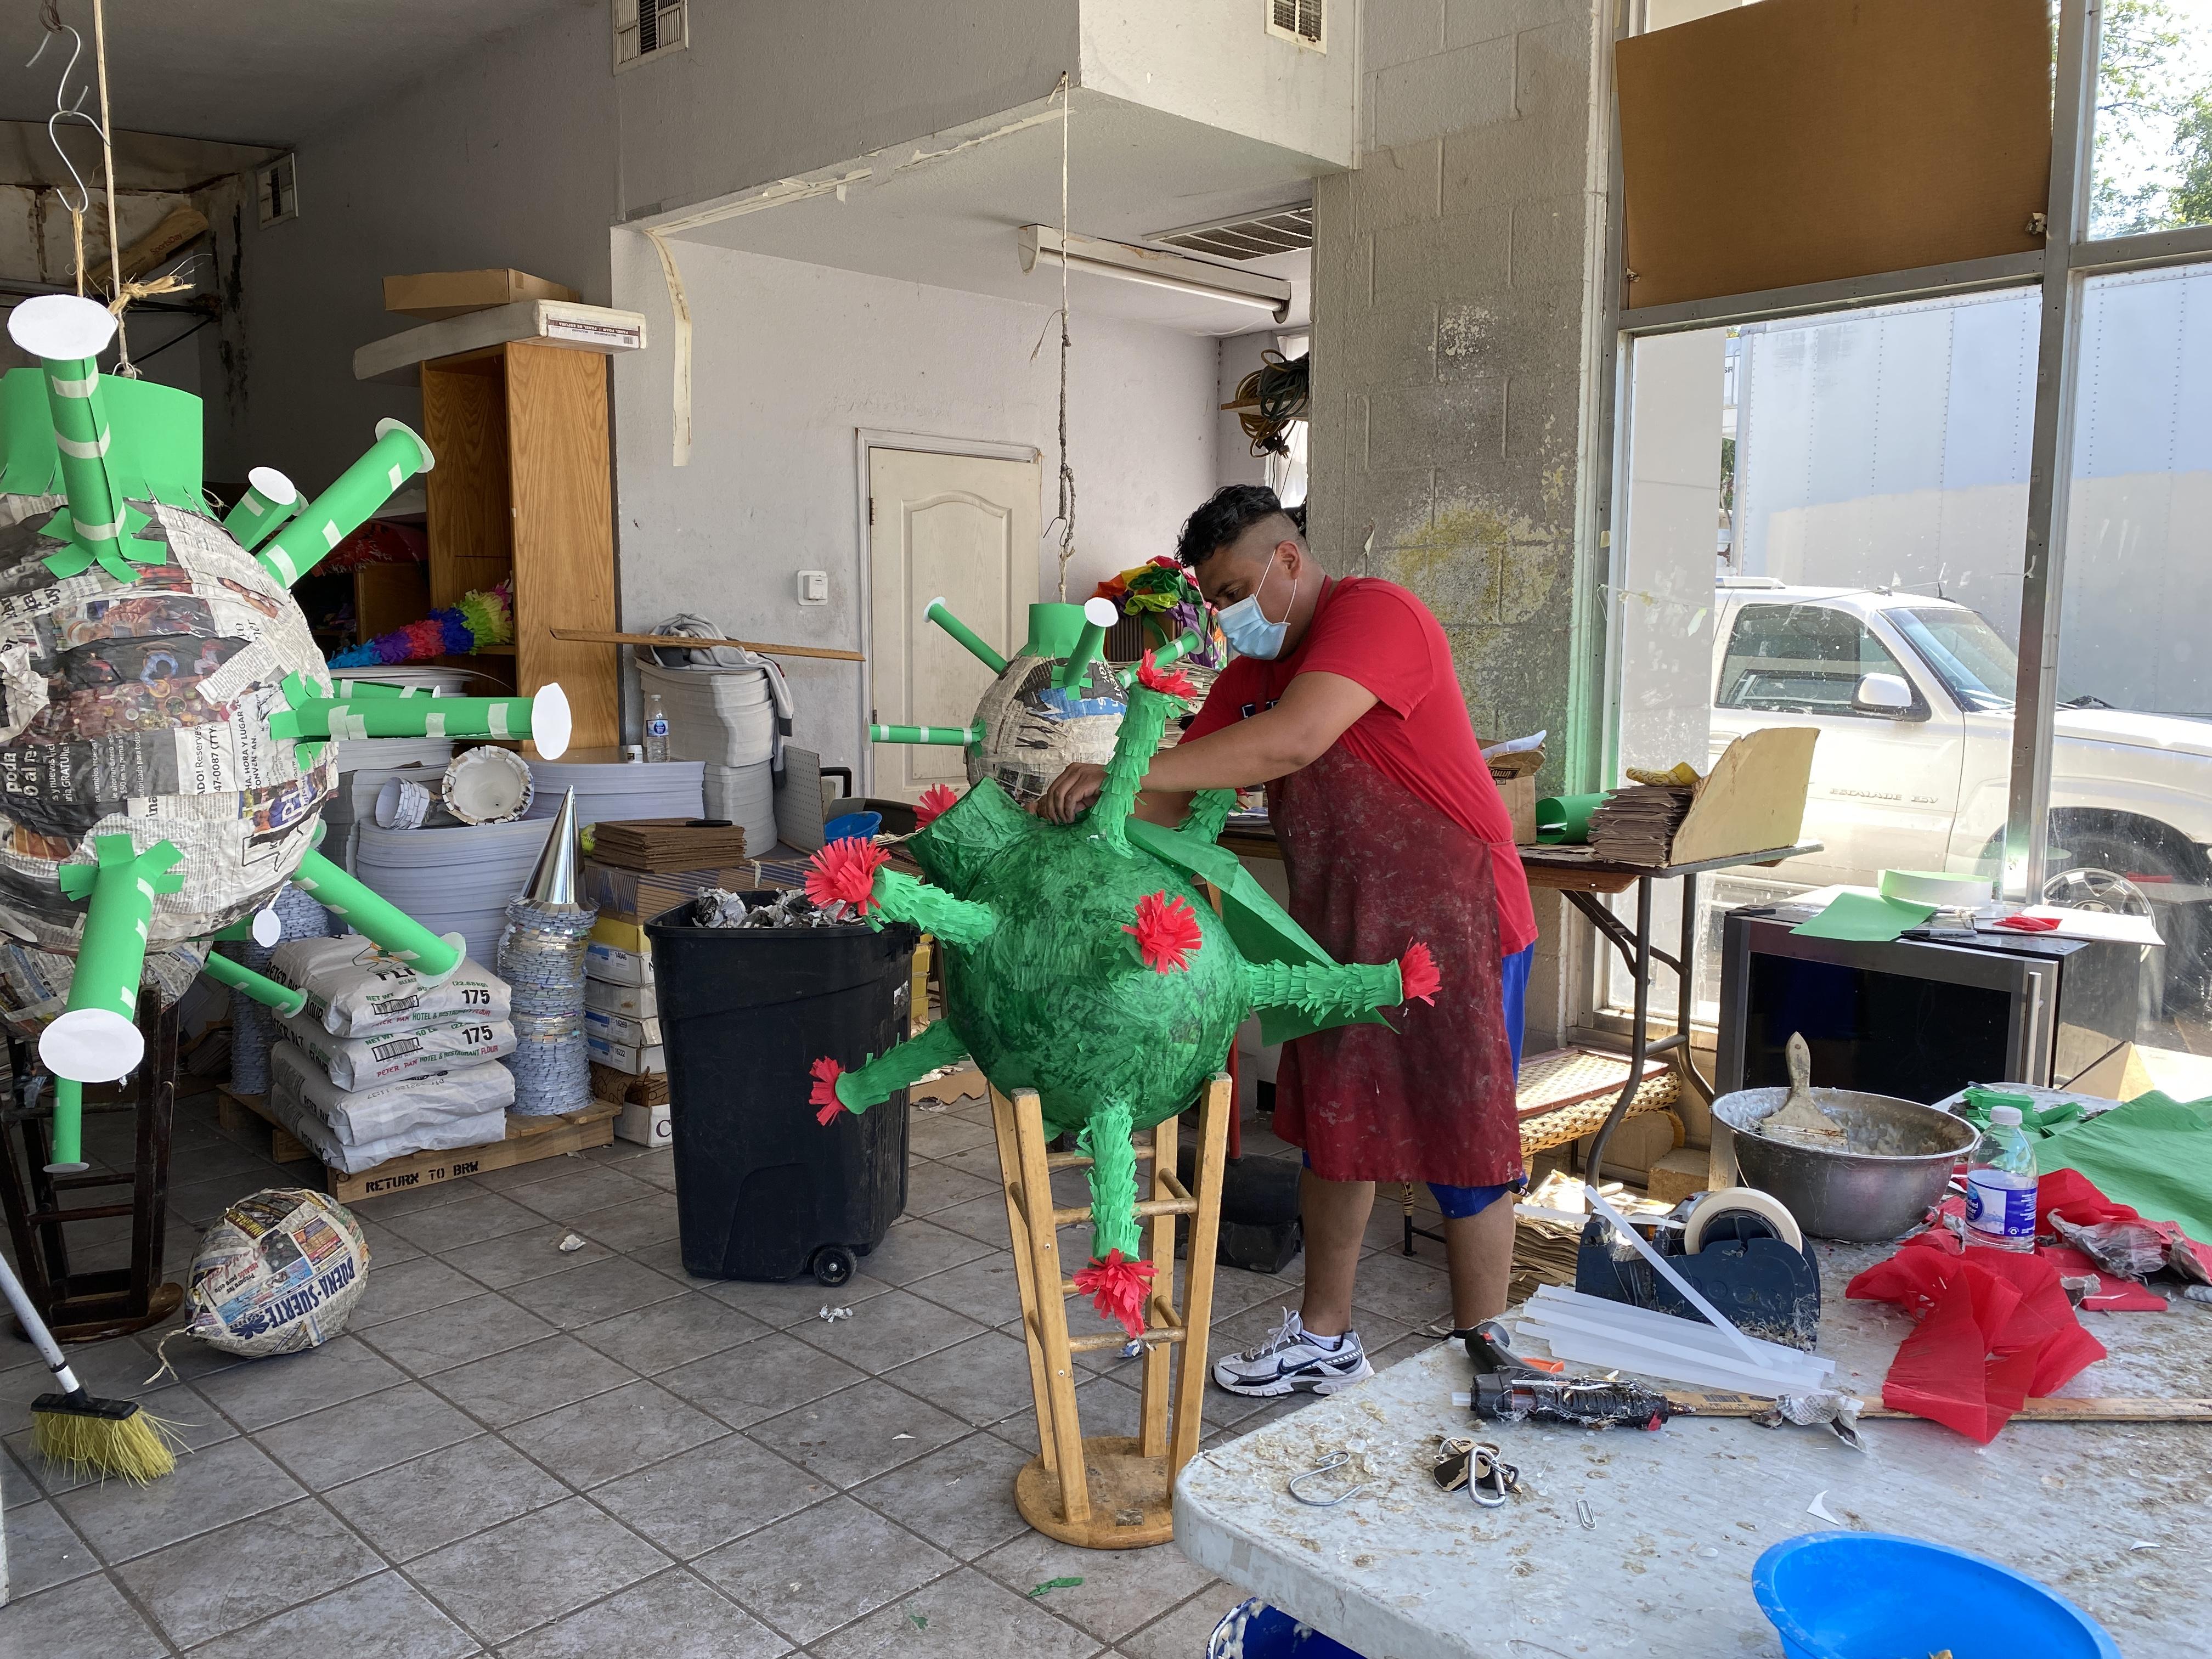 Coronavirus Piñatas are Big Business for Store That Reopens